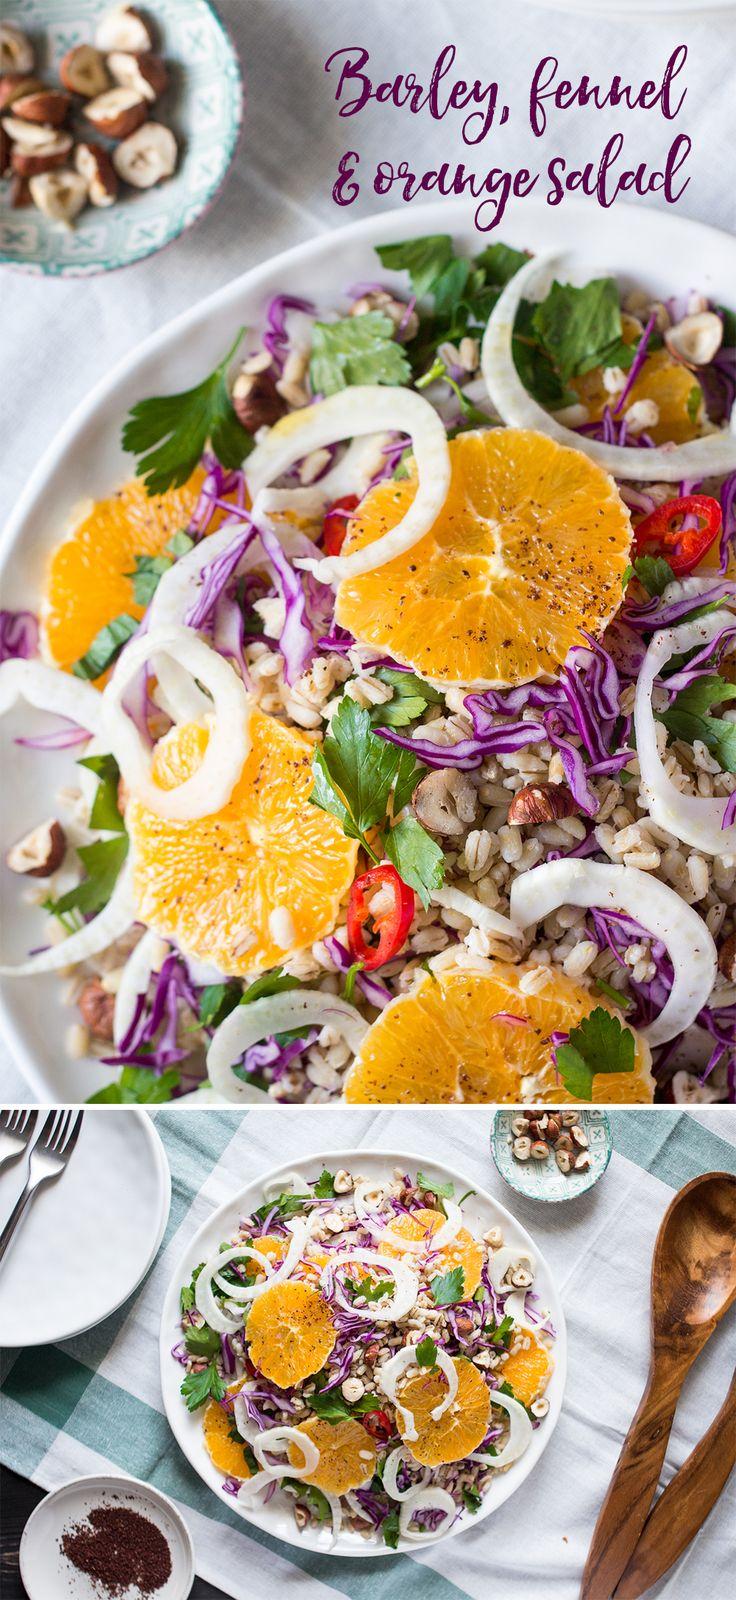 Vegan fennel and orange salad